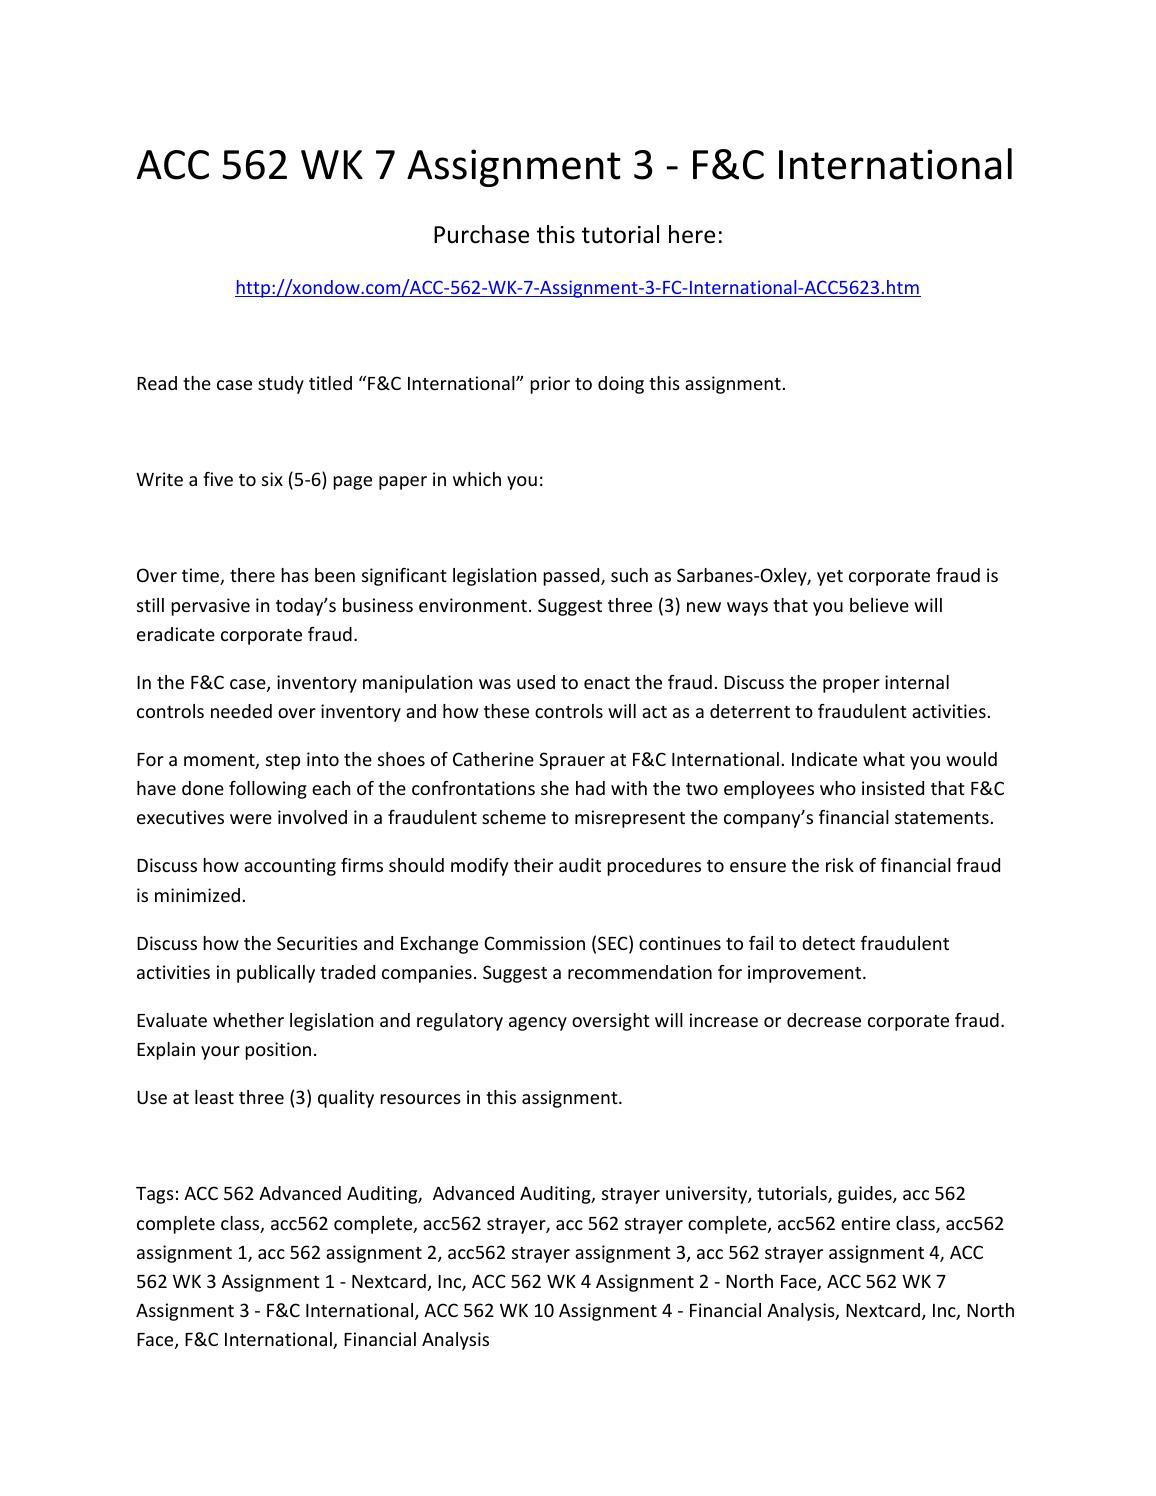 f&c international case study